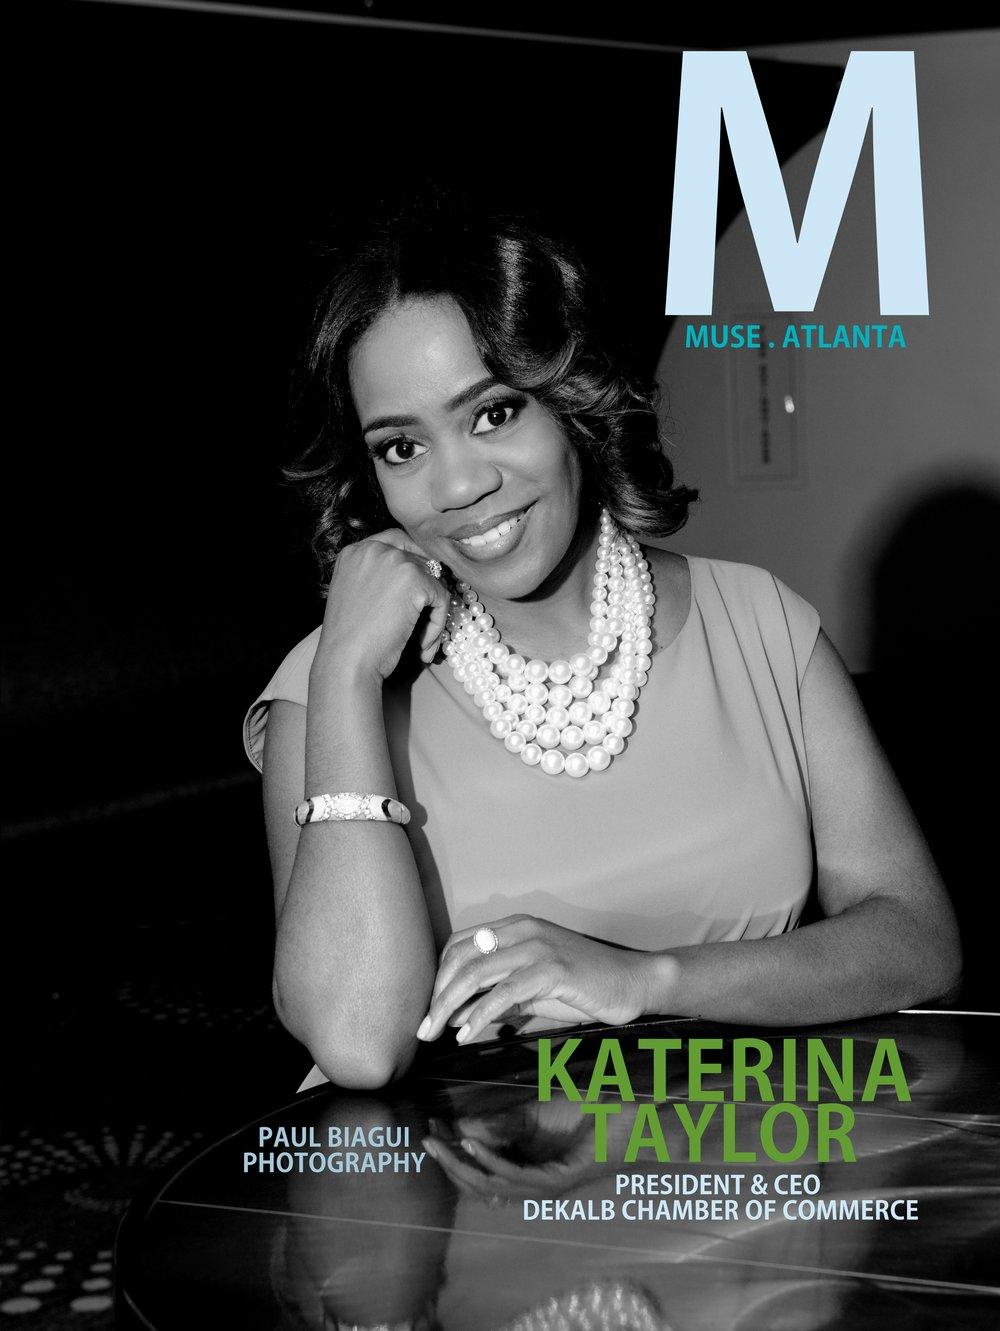 KATERINA BOOK COVER BW_pp.jpg